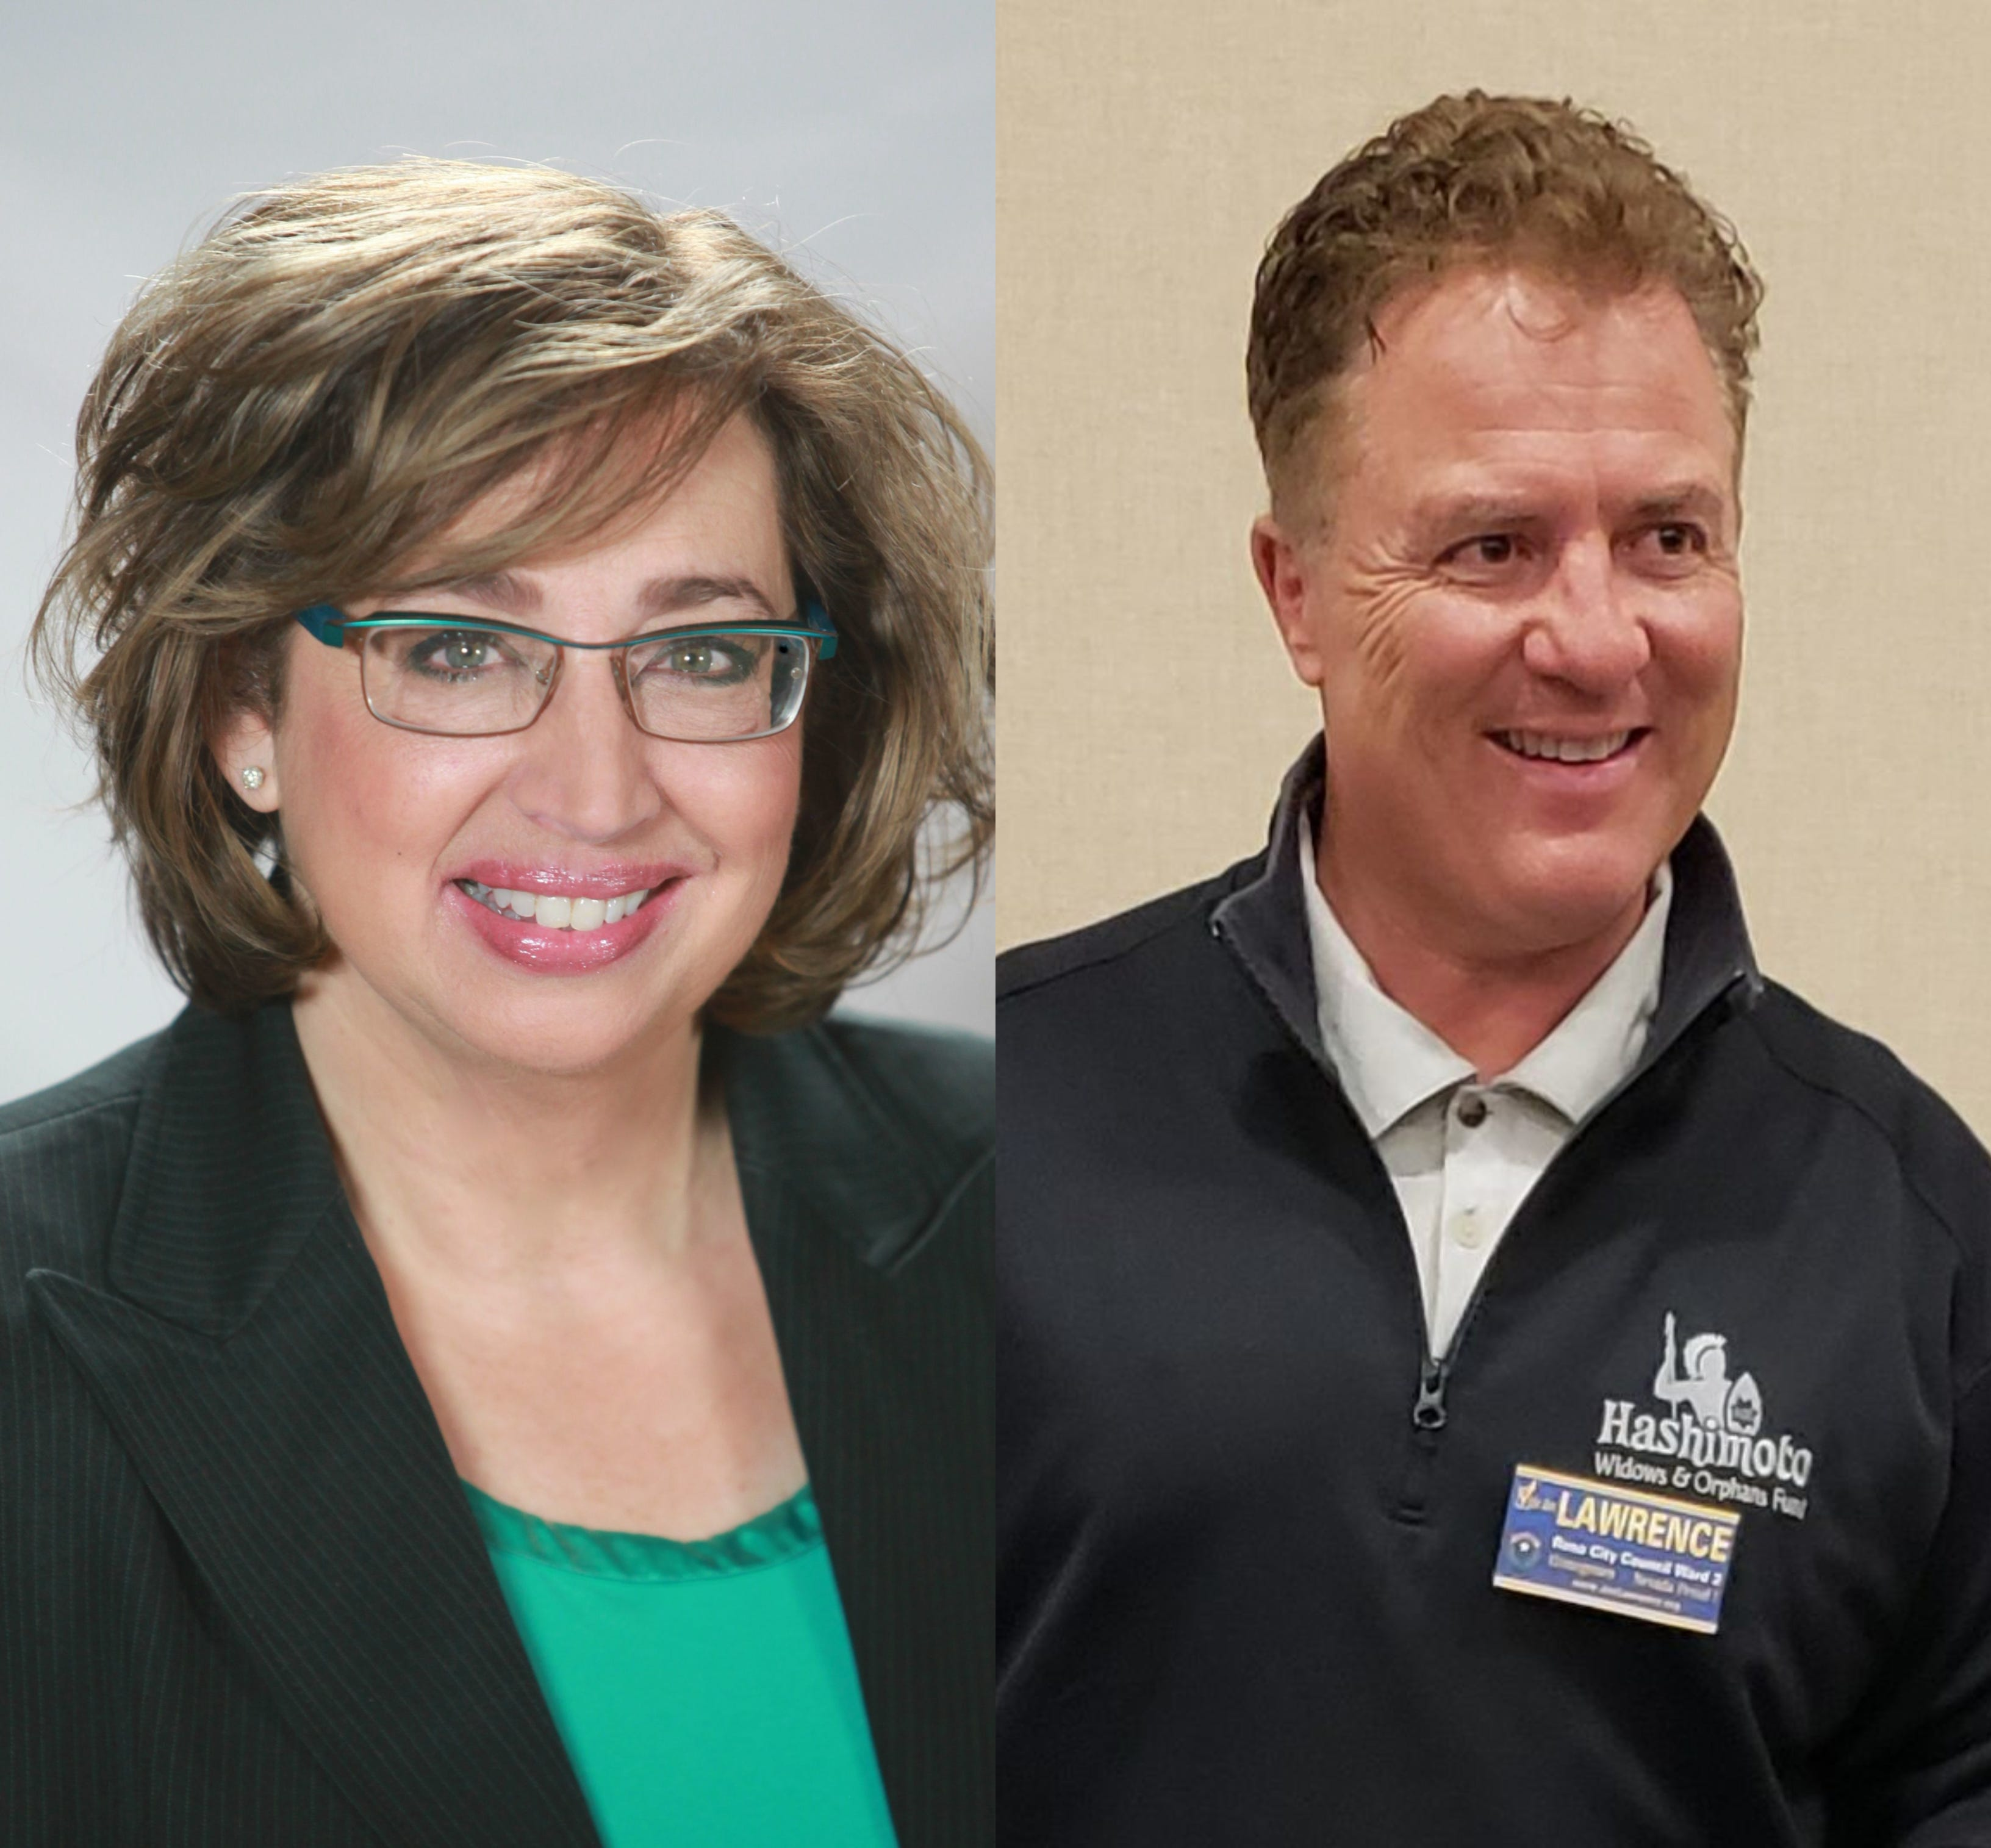 Your guide to the Reno City Council Ward 2 race: Naomi Duerr vs. Joe Lawrence | Reno Gazette Journal